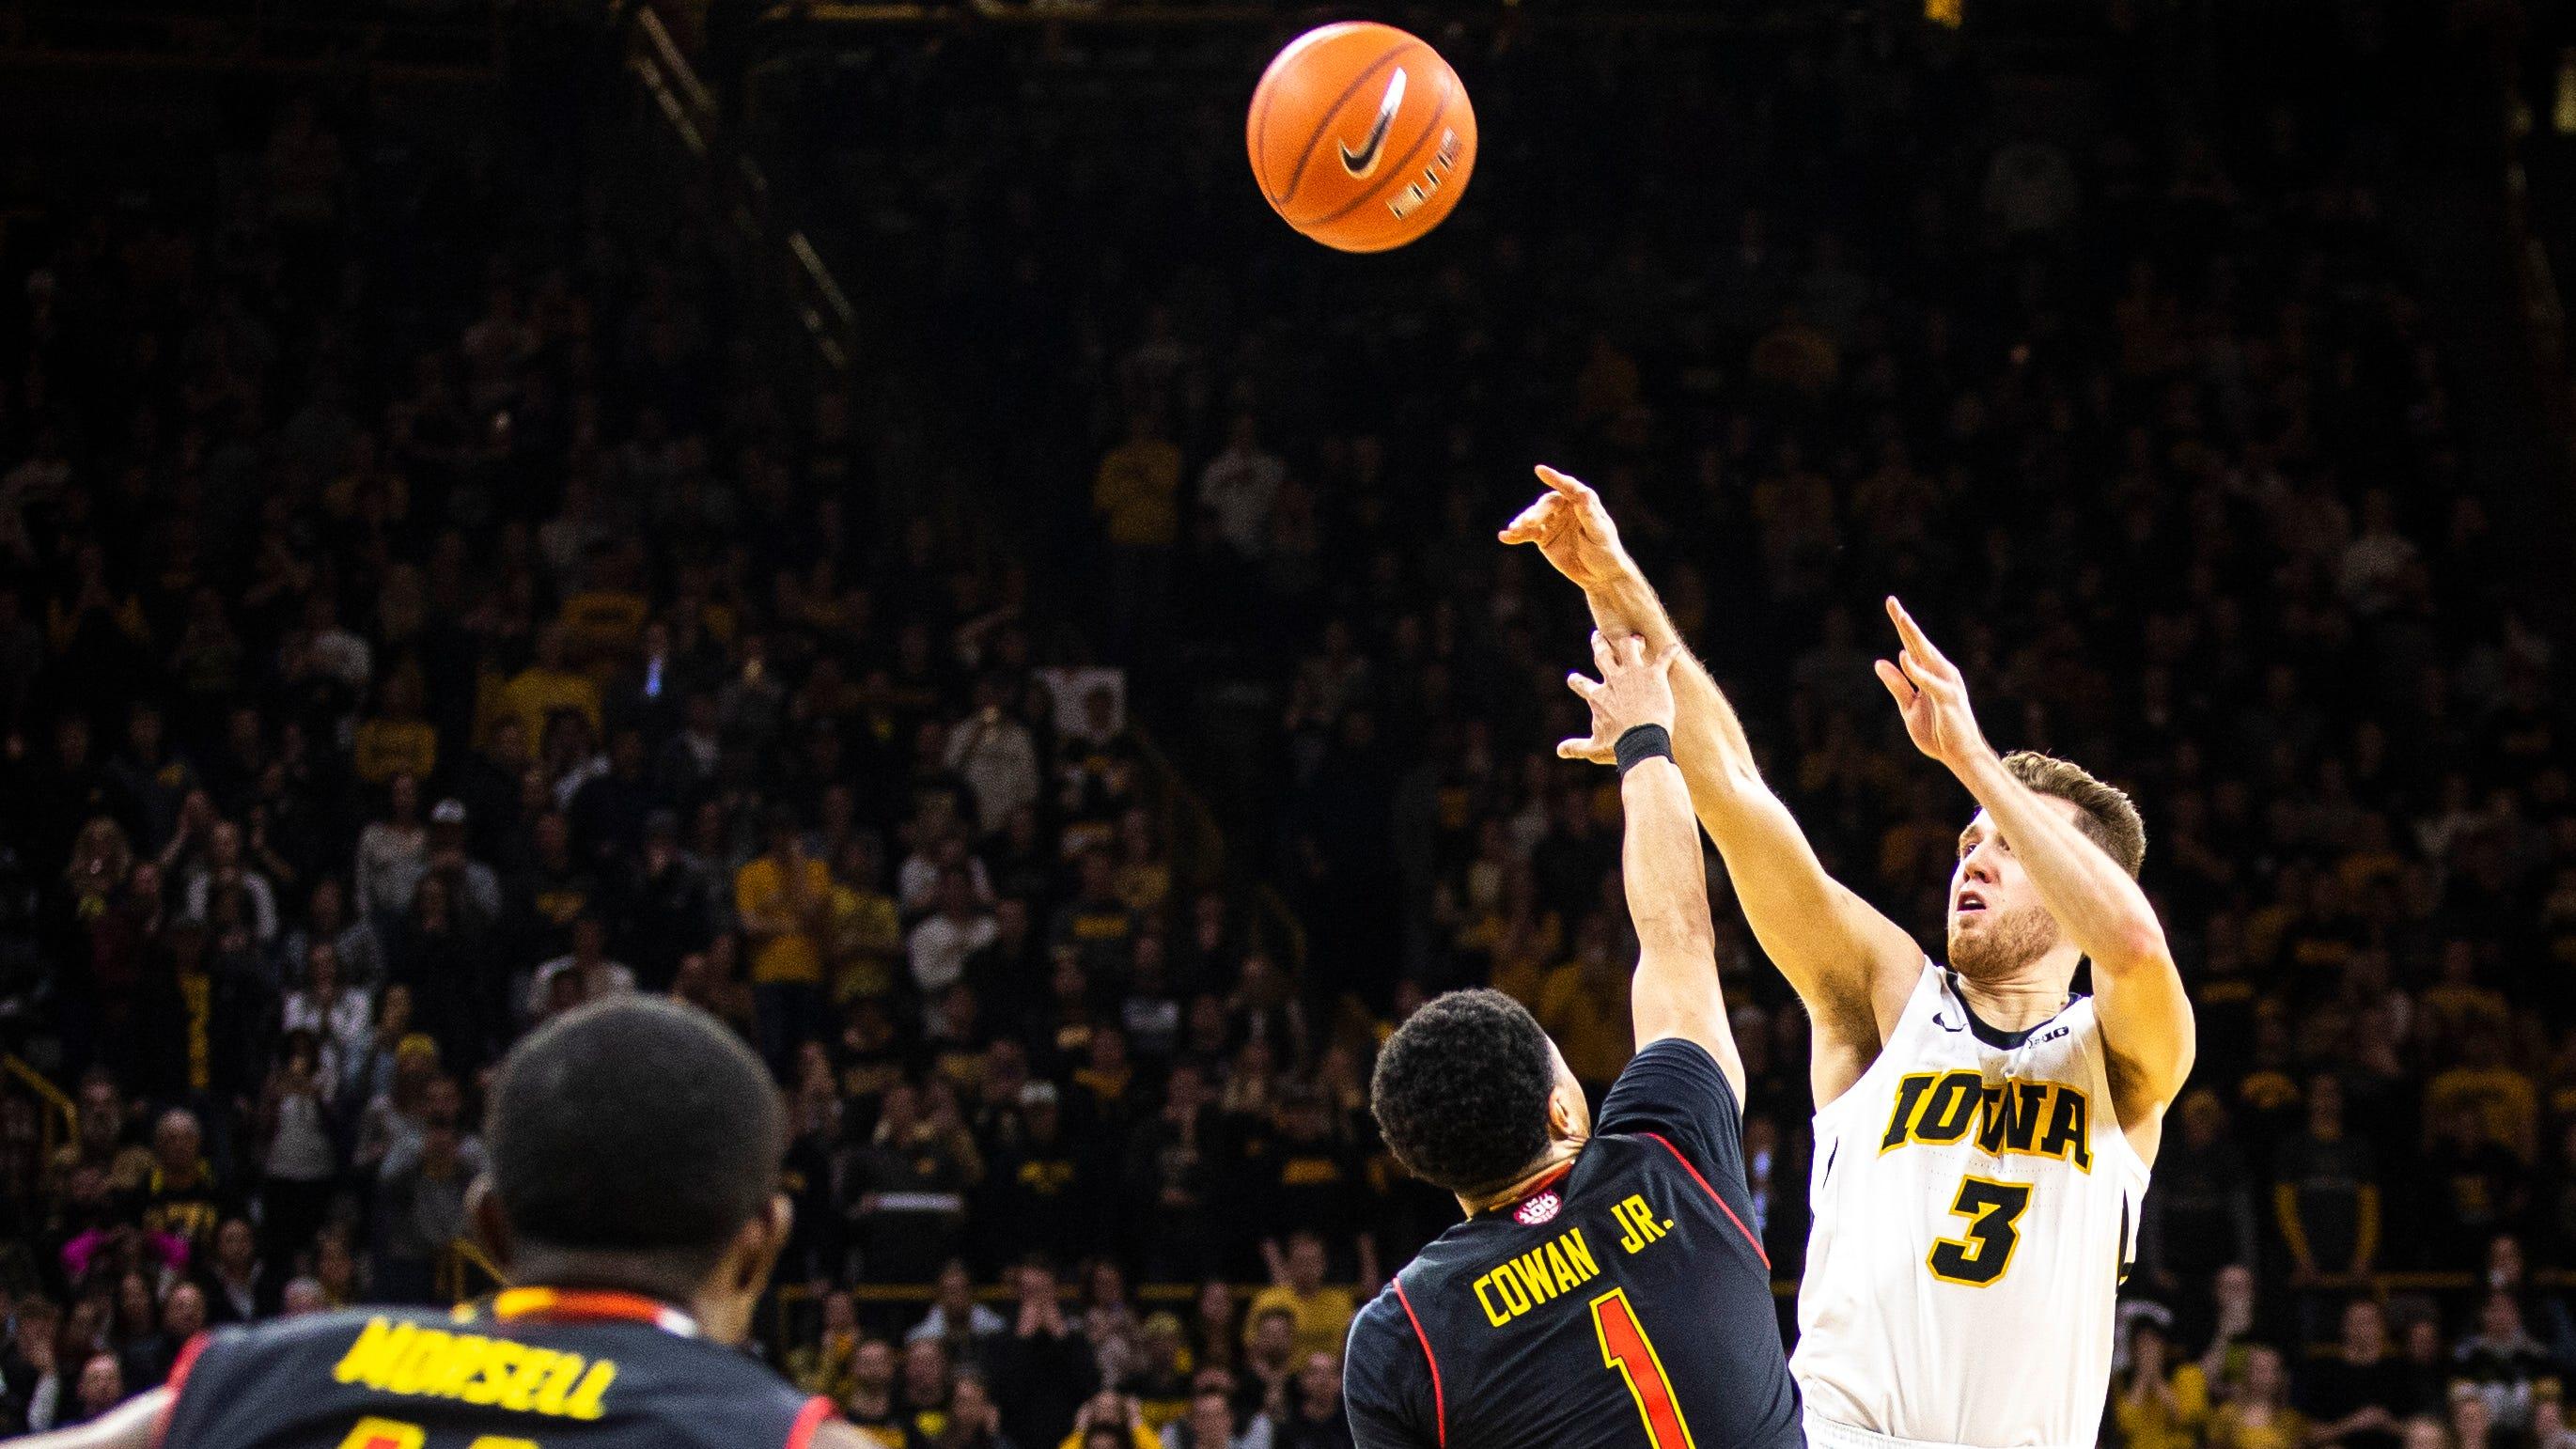 Iowa's last-second shots fall short; Maryland walks away with 66-65 win